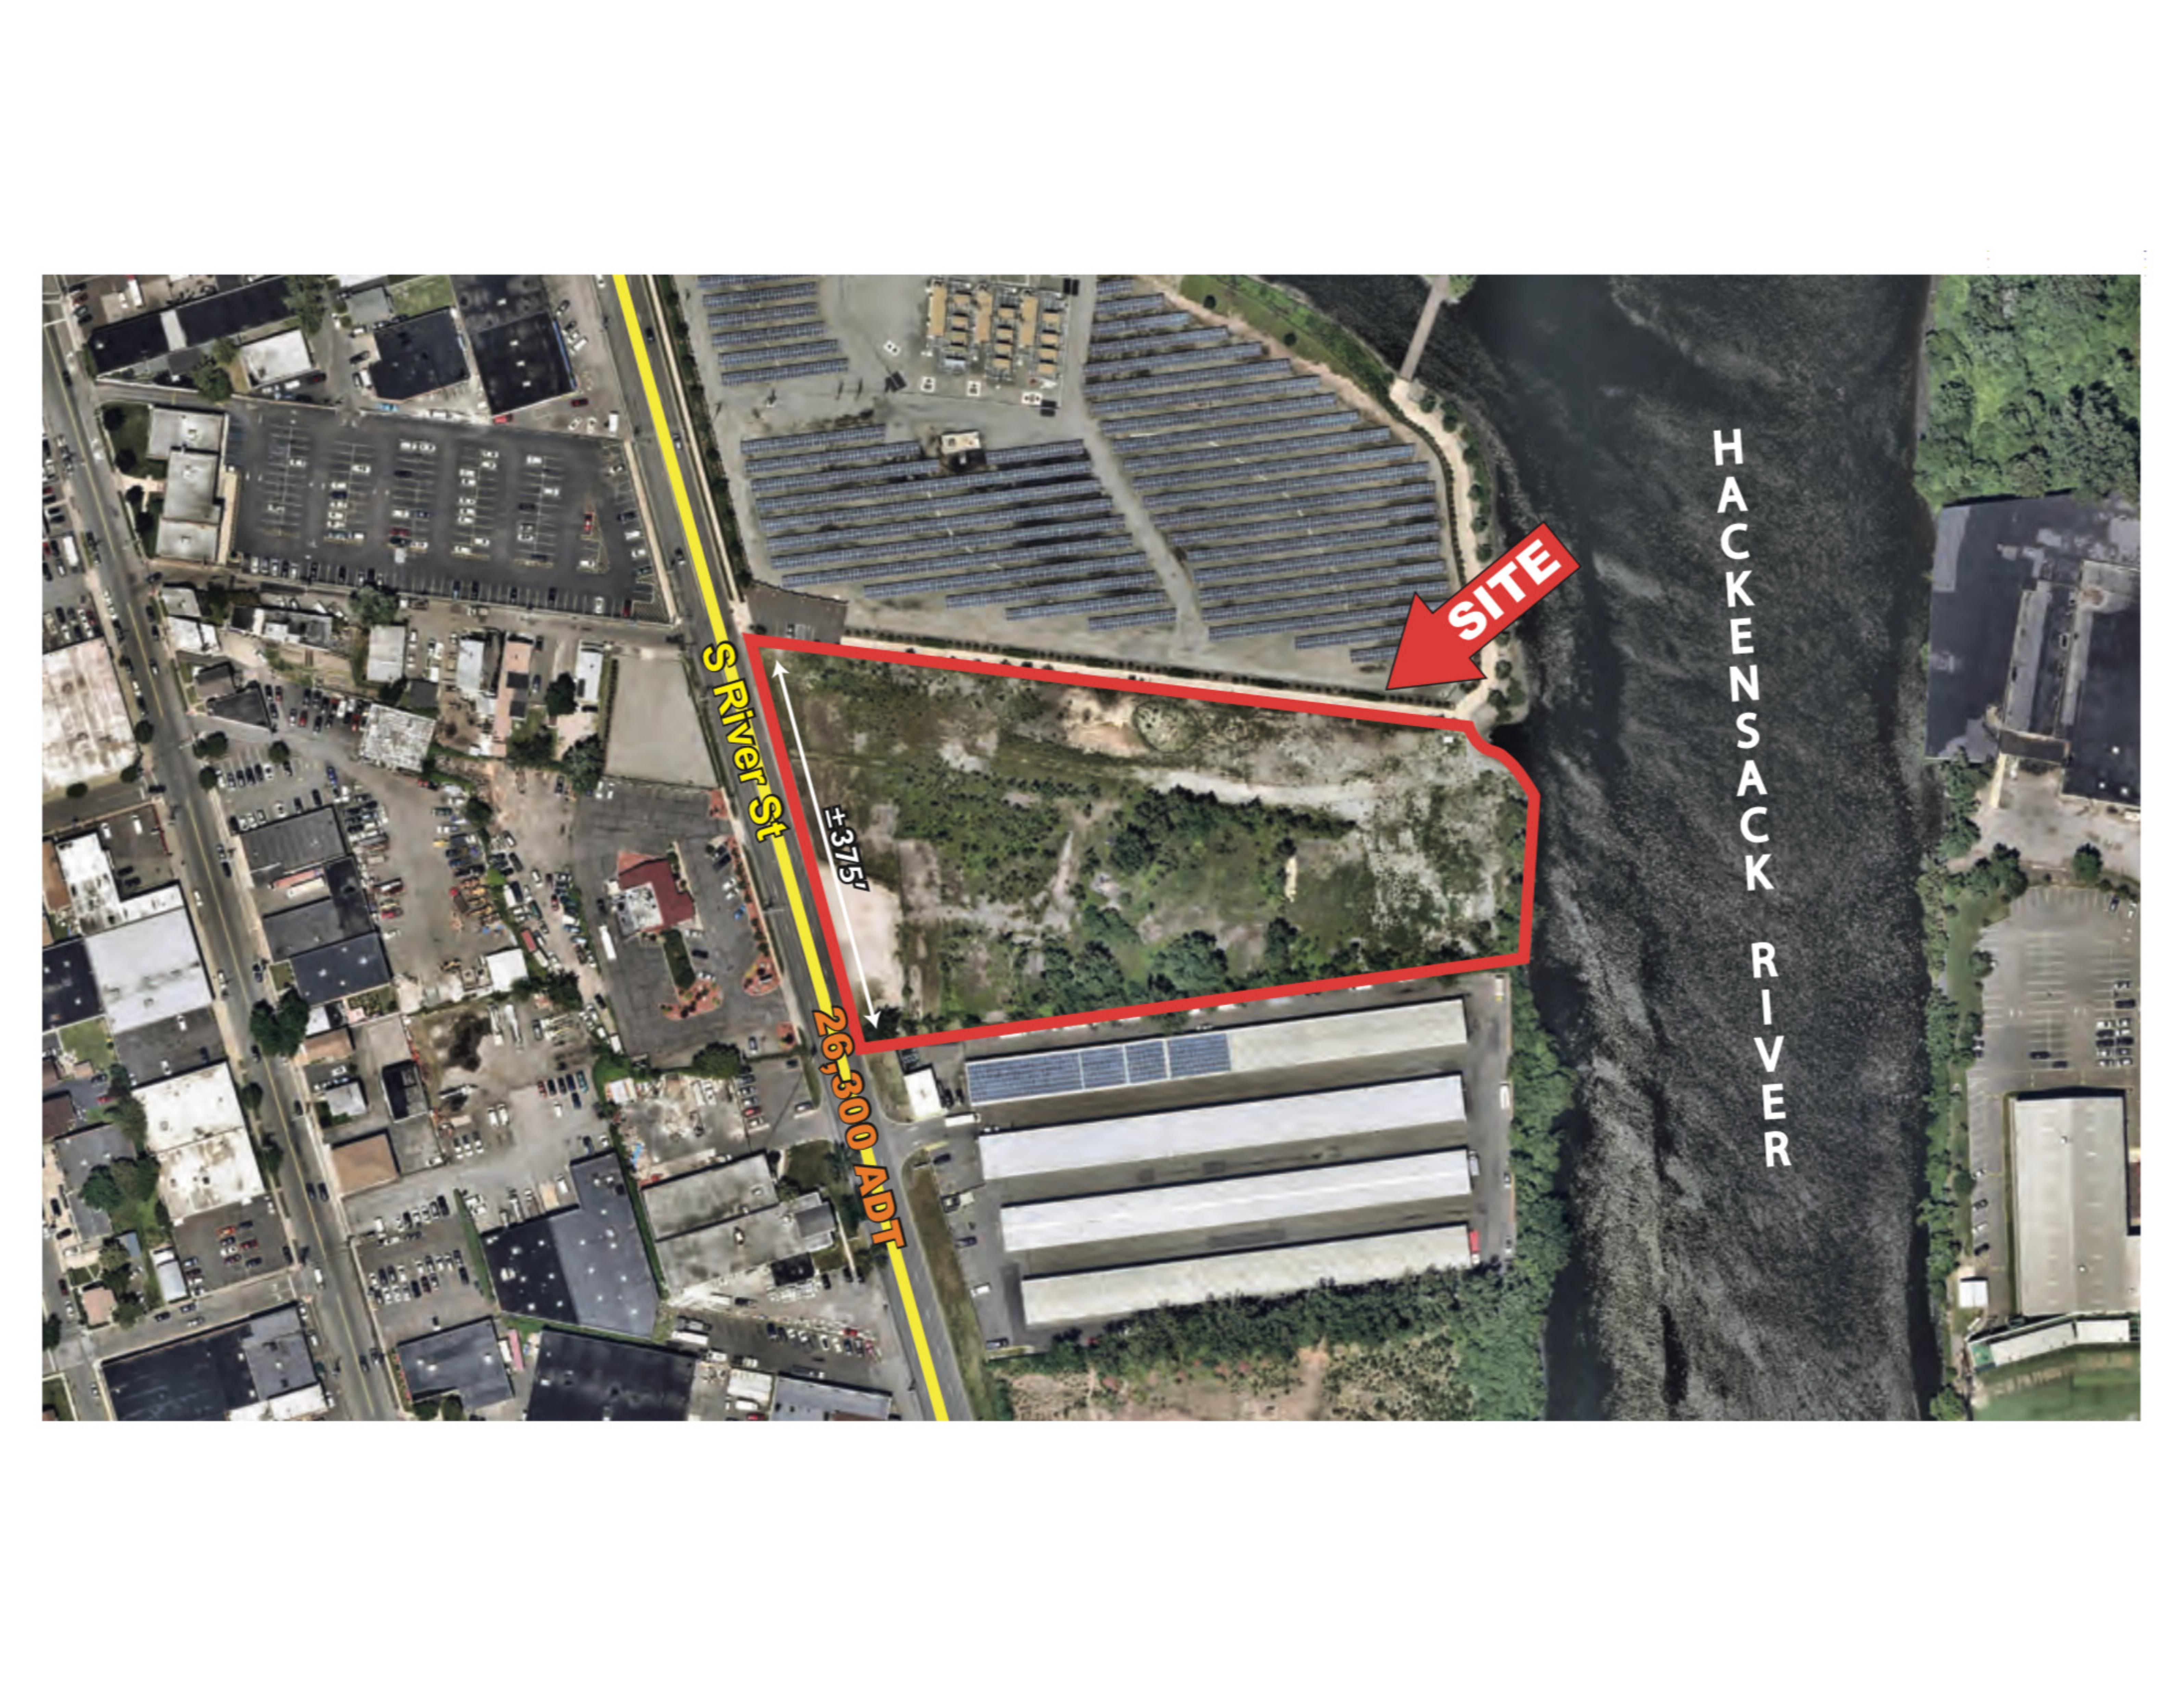 4 Acres for Development: site plan